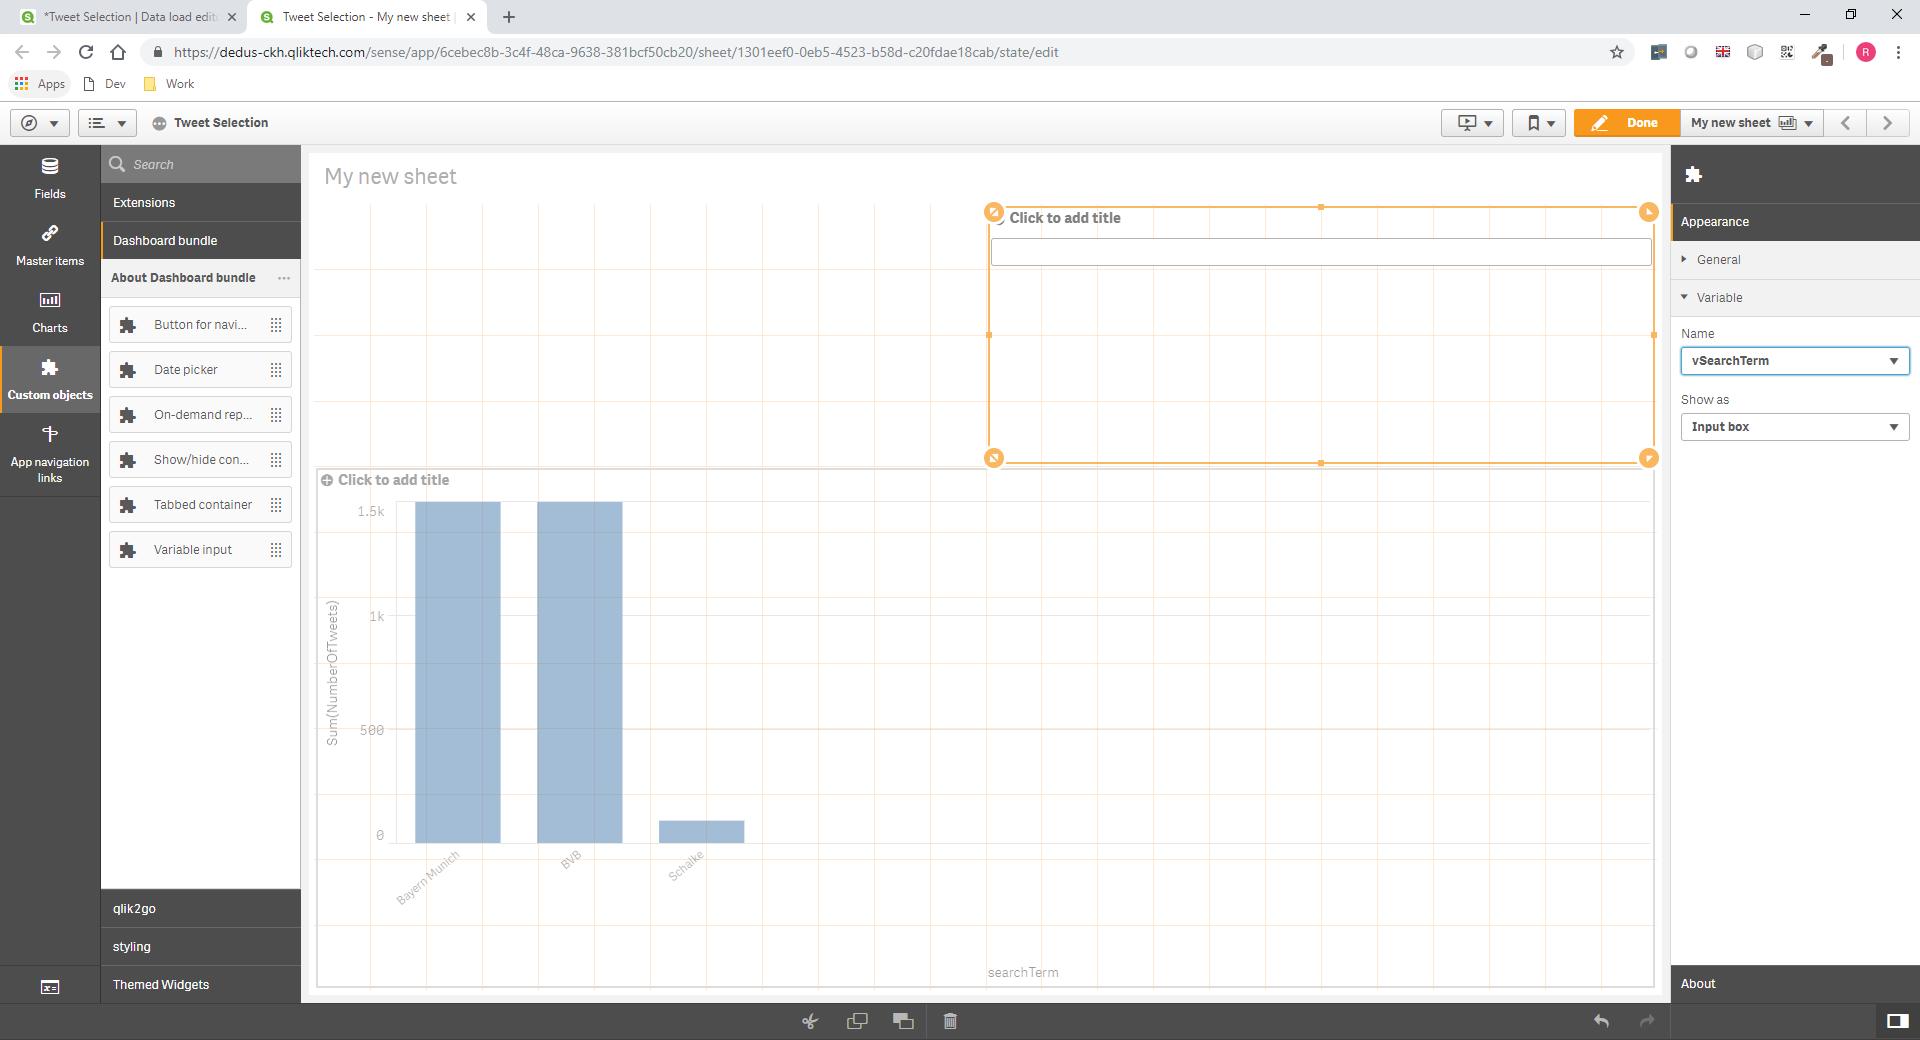 GitHub - rileymd88/odag-variable: a Qlik Sense extension